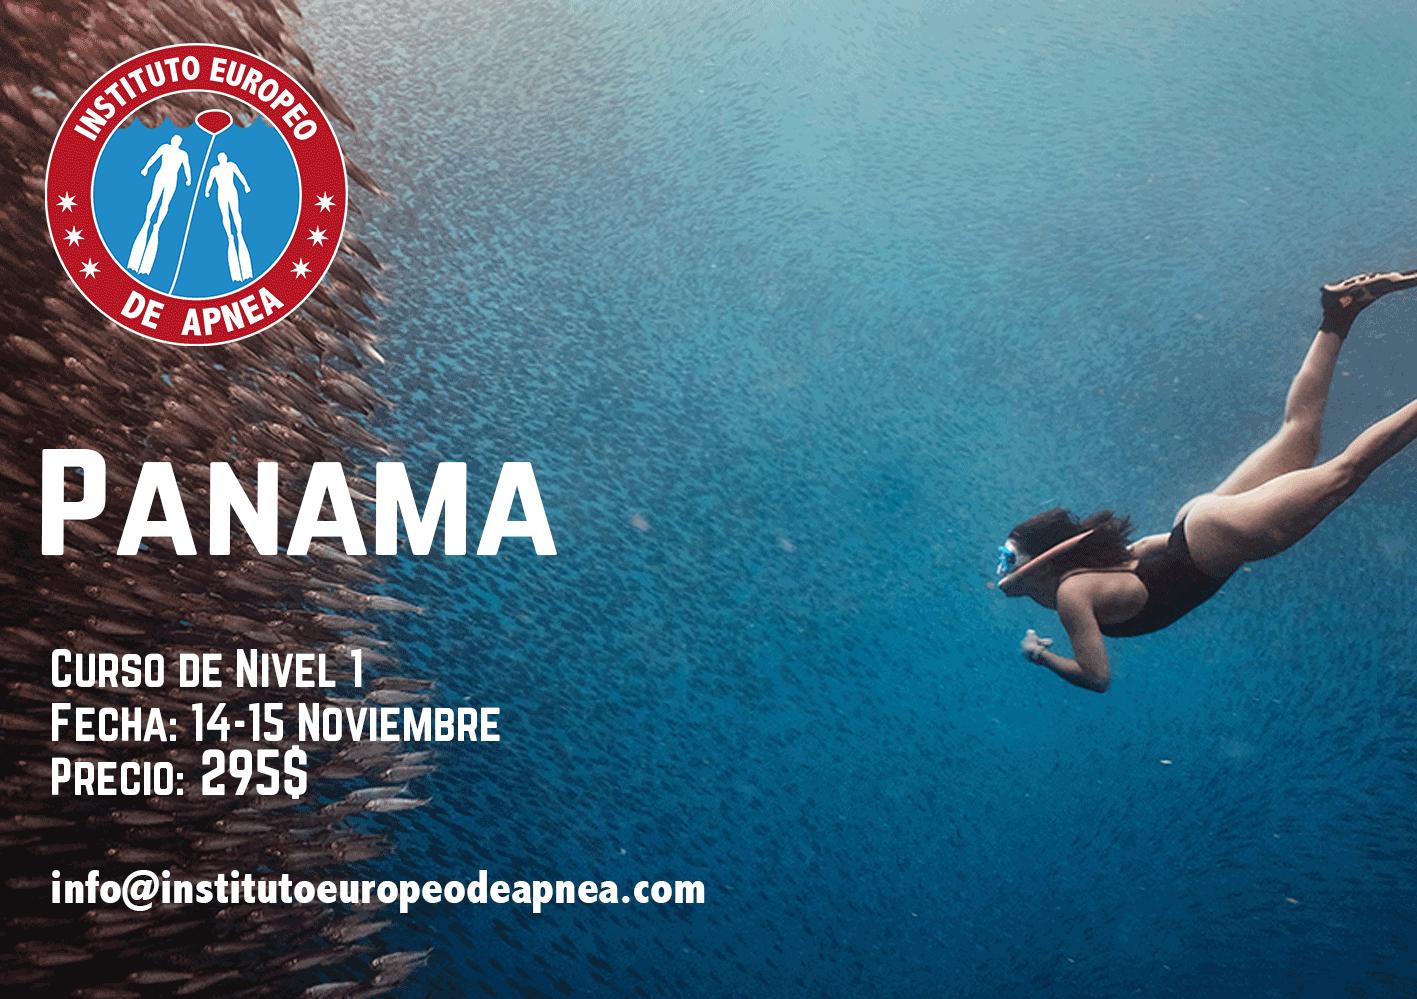 Curso de apnea en Panamá